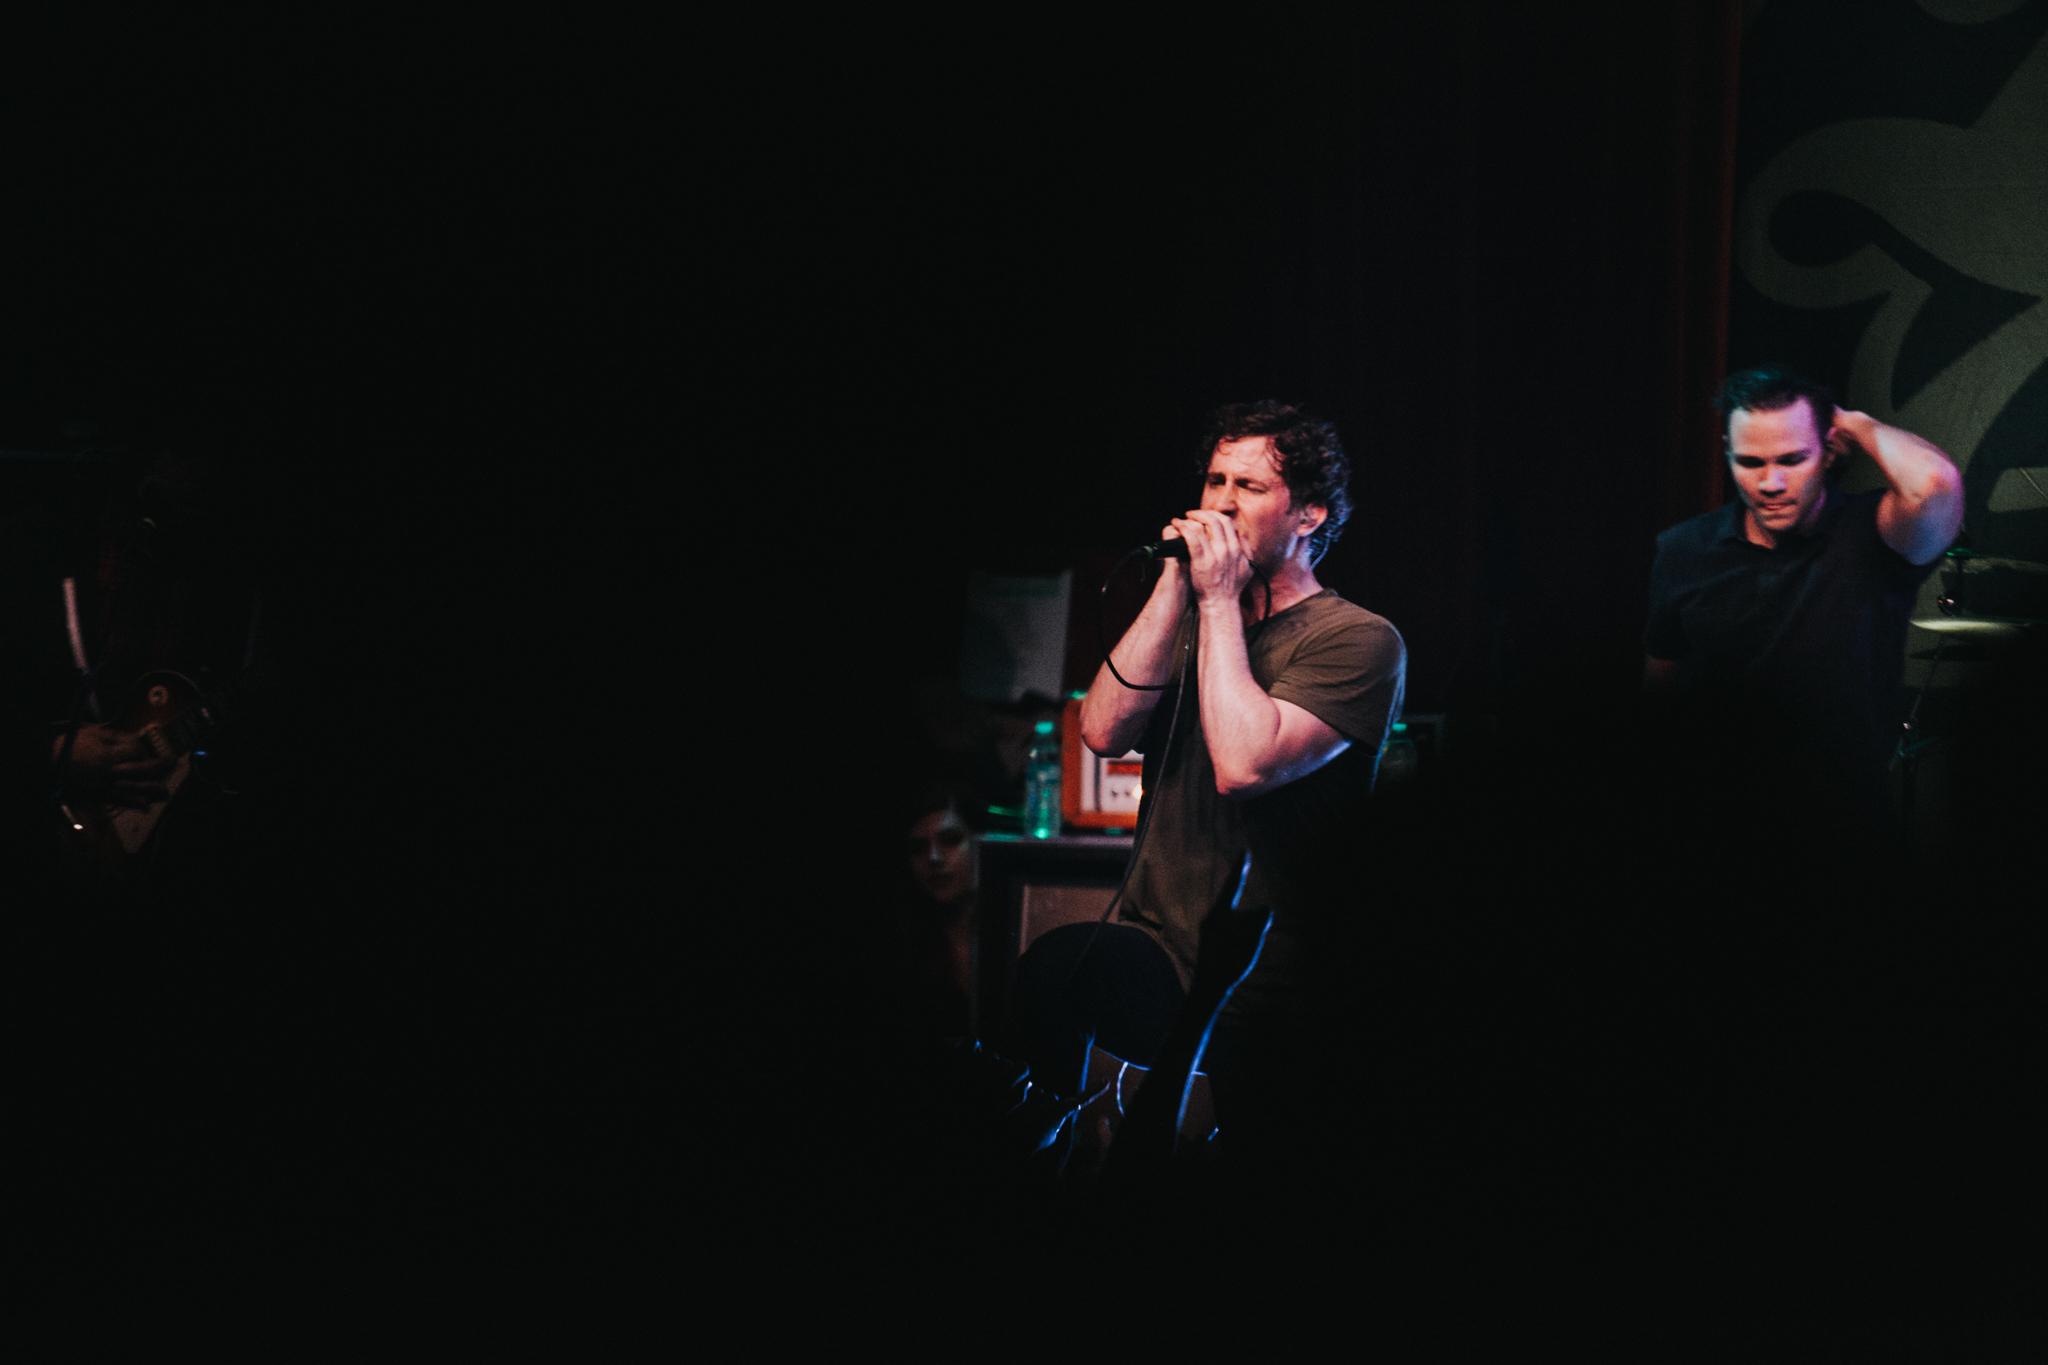 Lafferty Photo - Dance Gavin Dance 03.08.17-8519.jpg